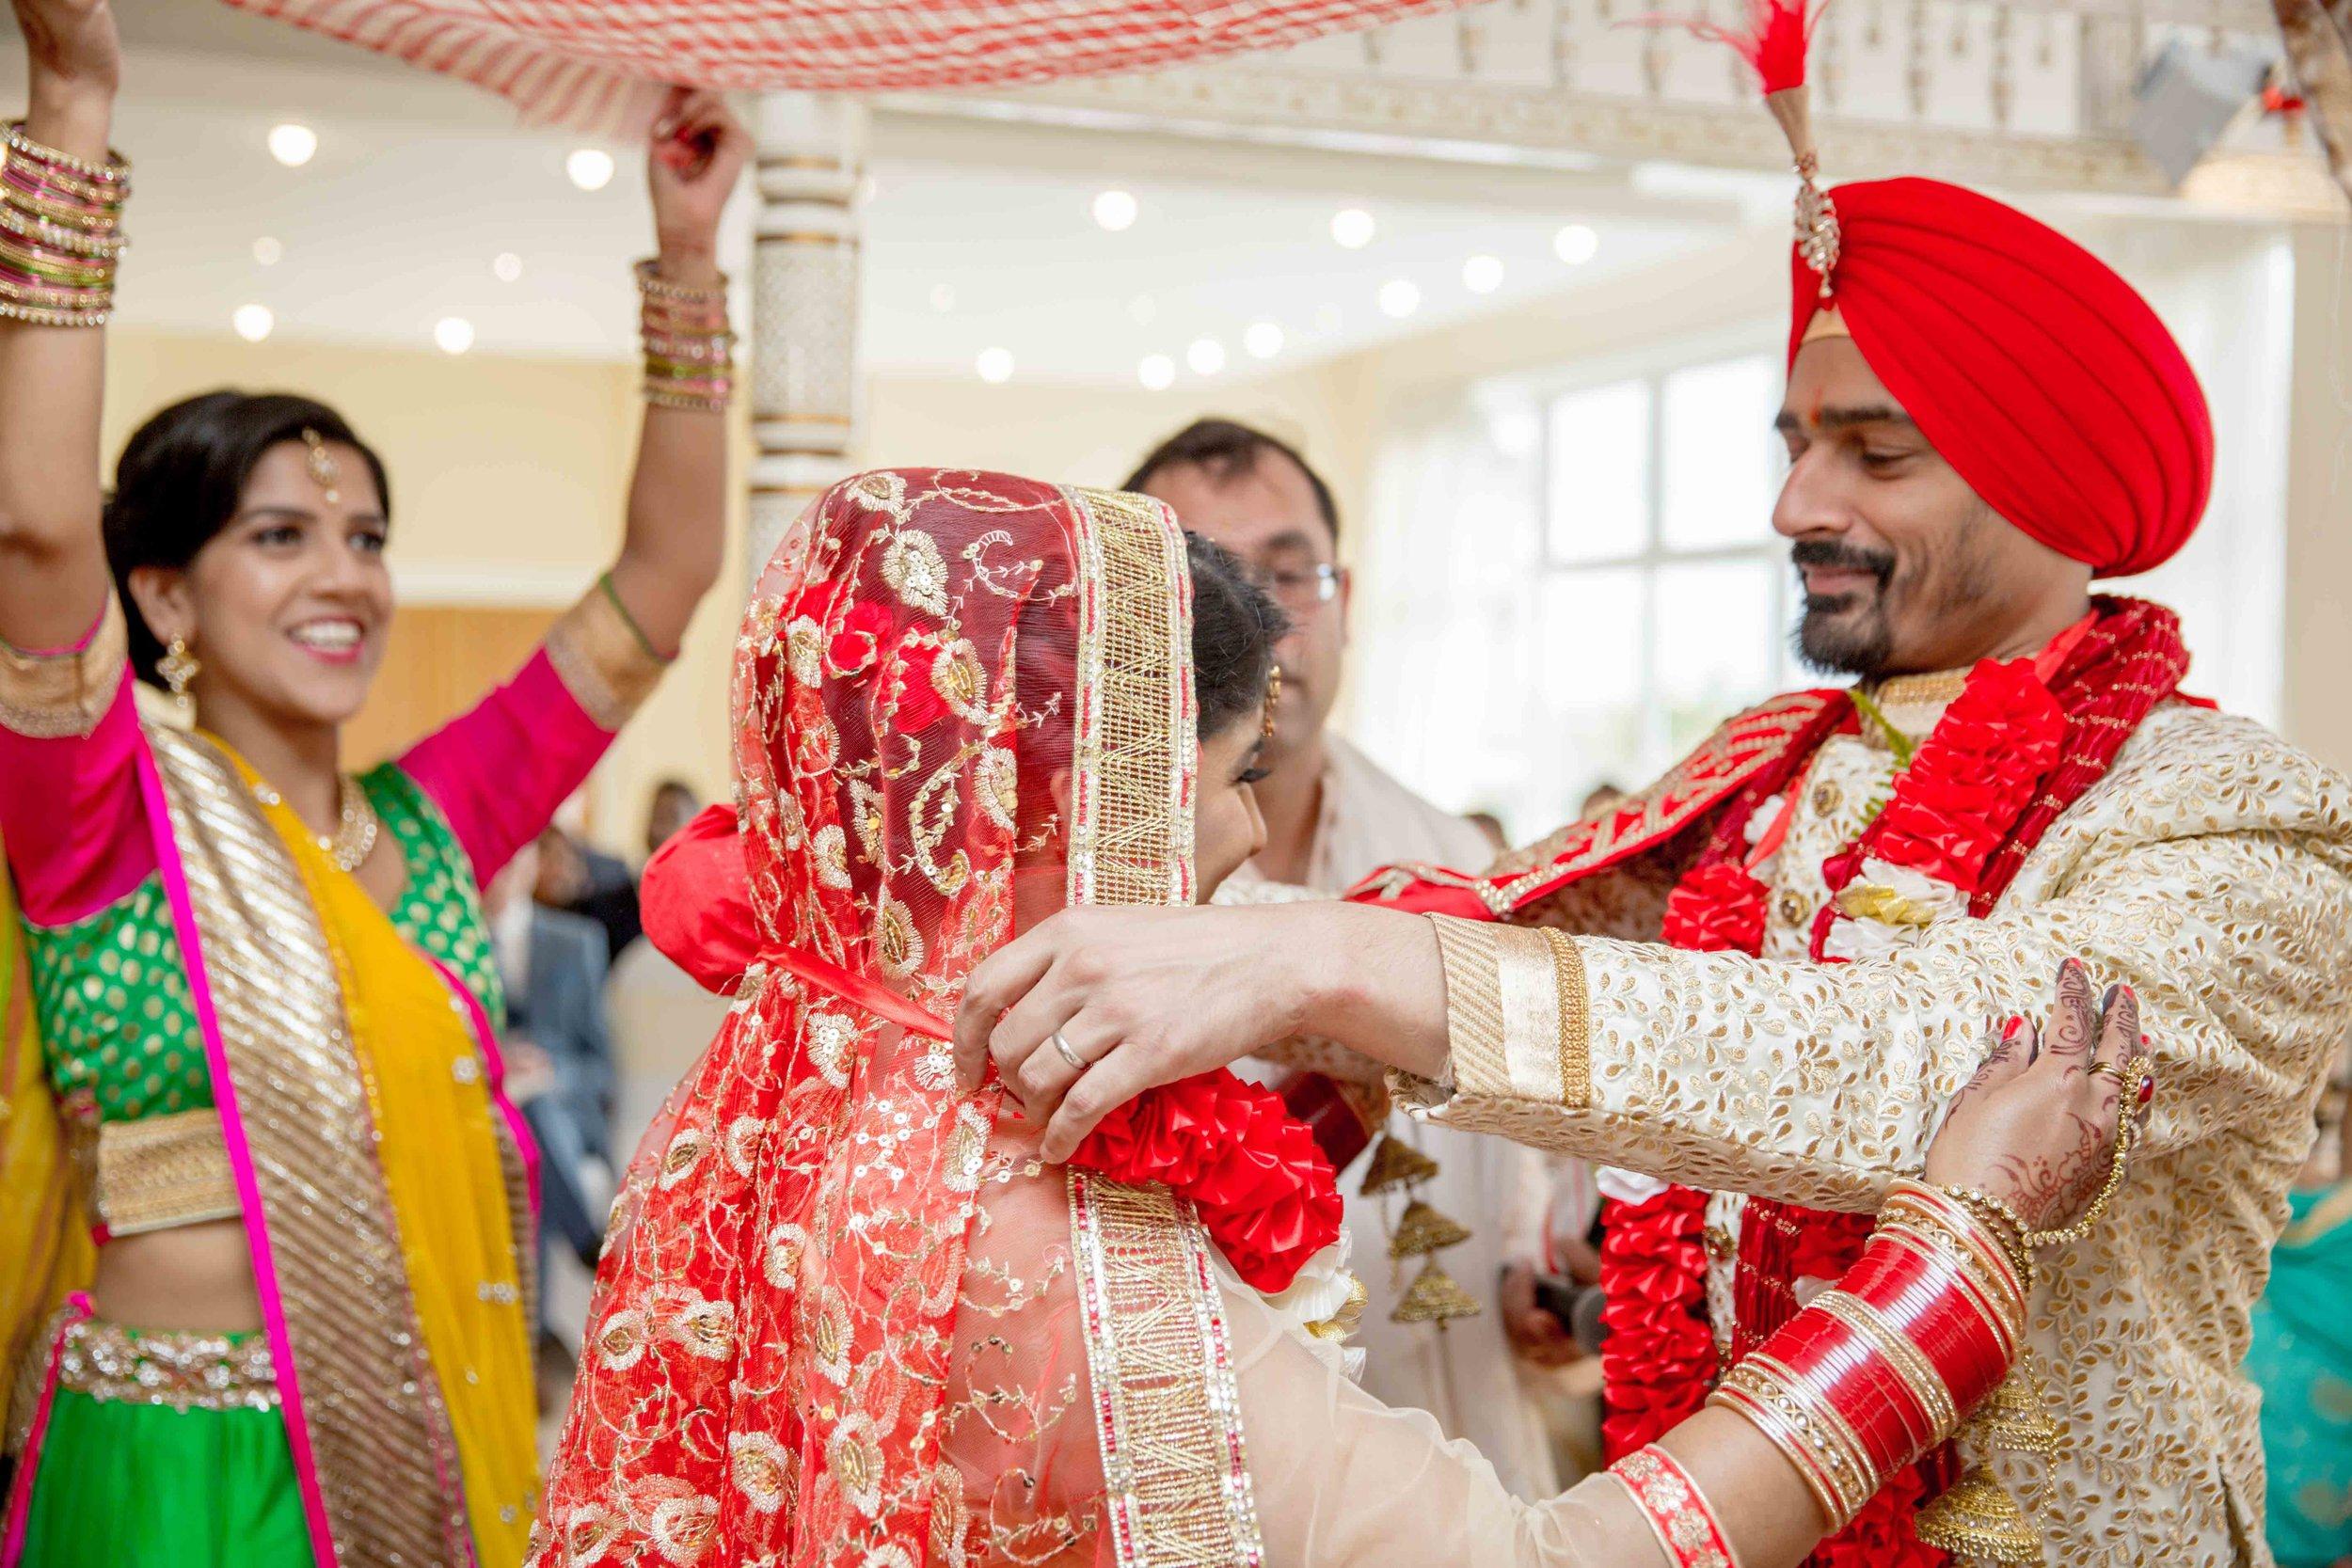 ramada-park-hall-hotel-birmingham-wolverhampton-hindu-wedding-asian-wedding-photography-natalia-smith-photography-24.jpg